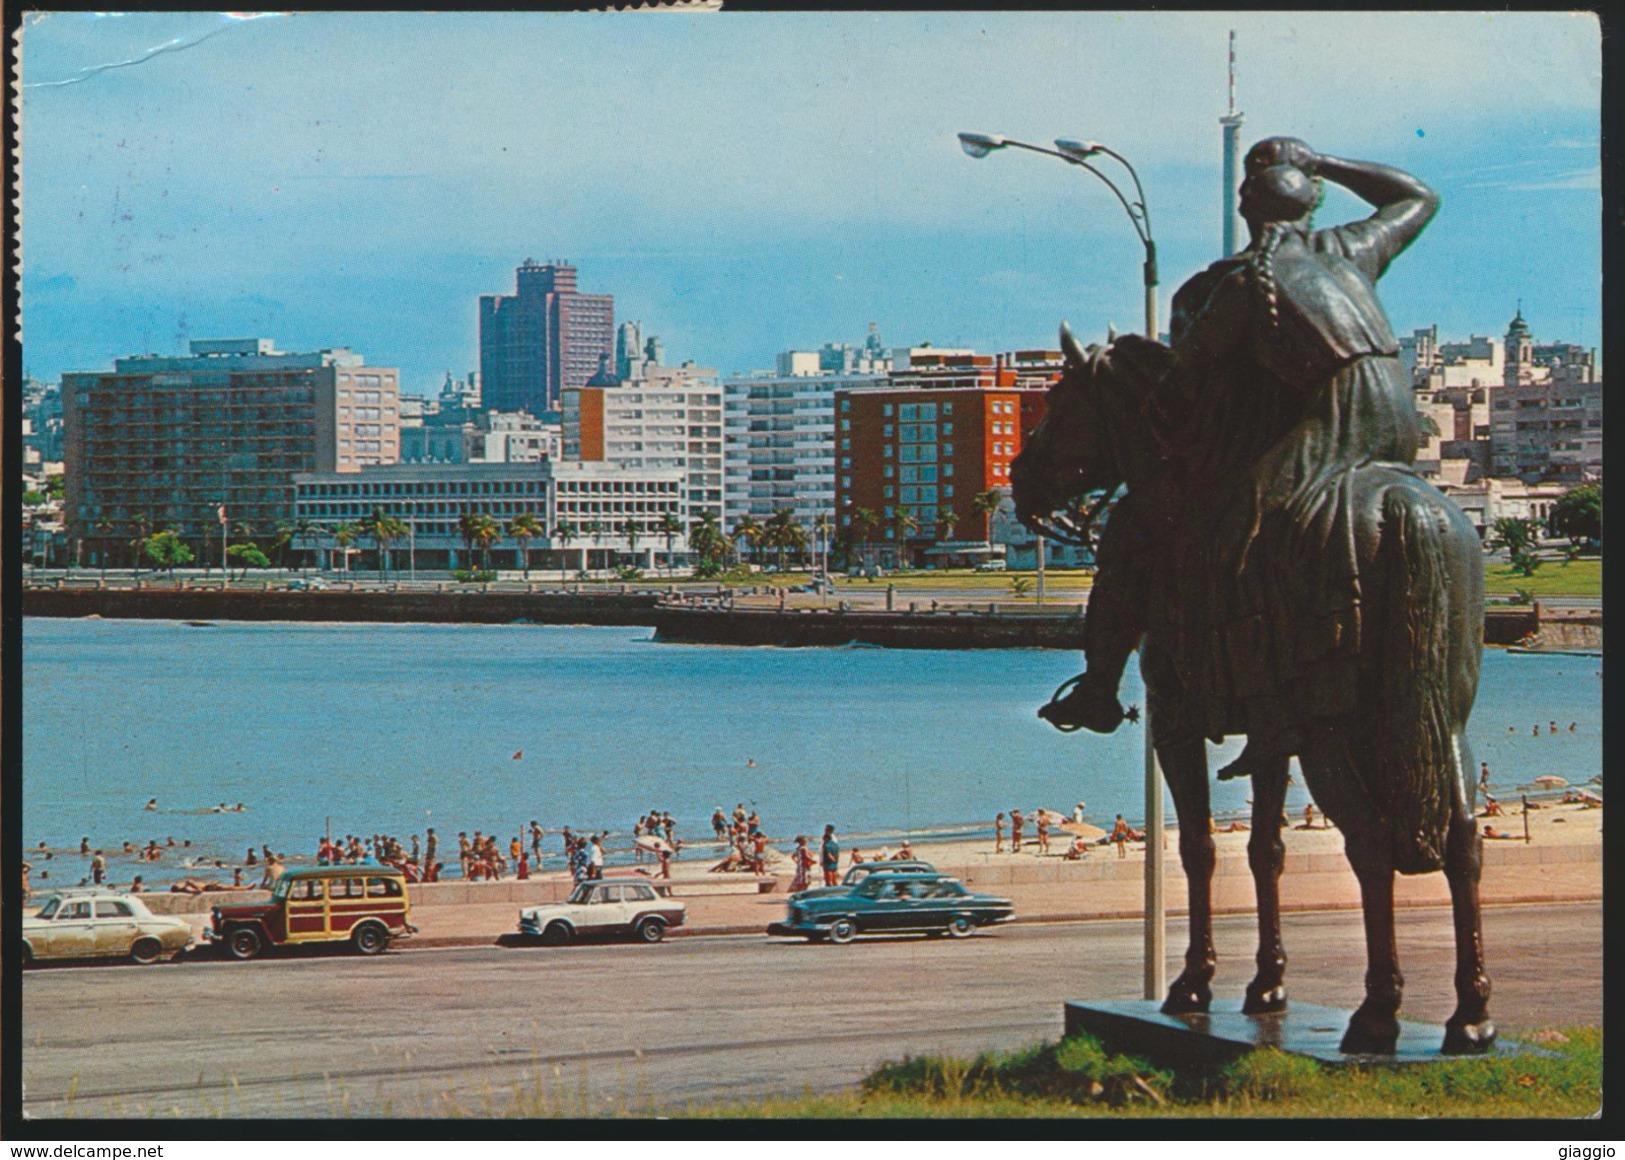 °°° 3690 - URUGUAY - MONTEVIDEO - MONUMENTO NUEVOS RUMBOS - PLAYA RAMIREZ - 1995 With Stamps °°° - Uruguay